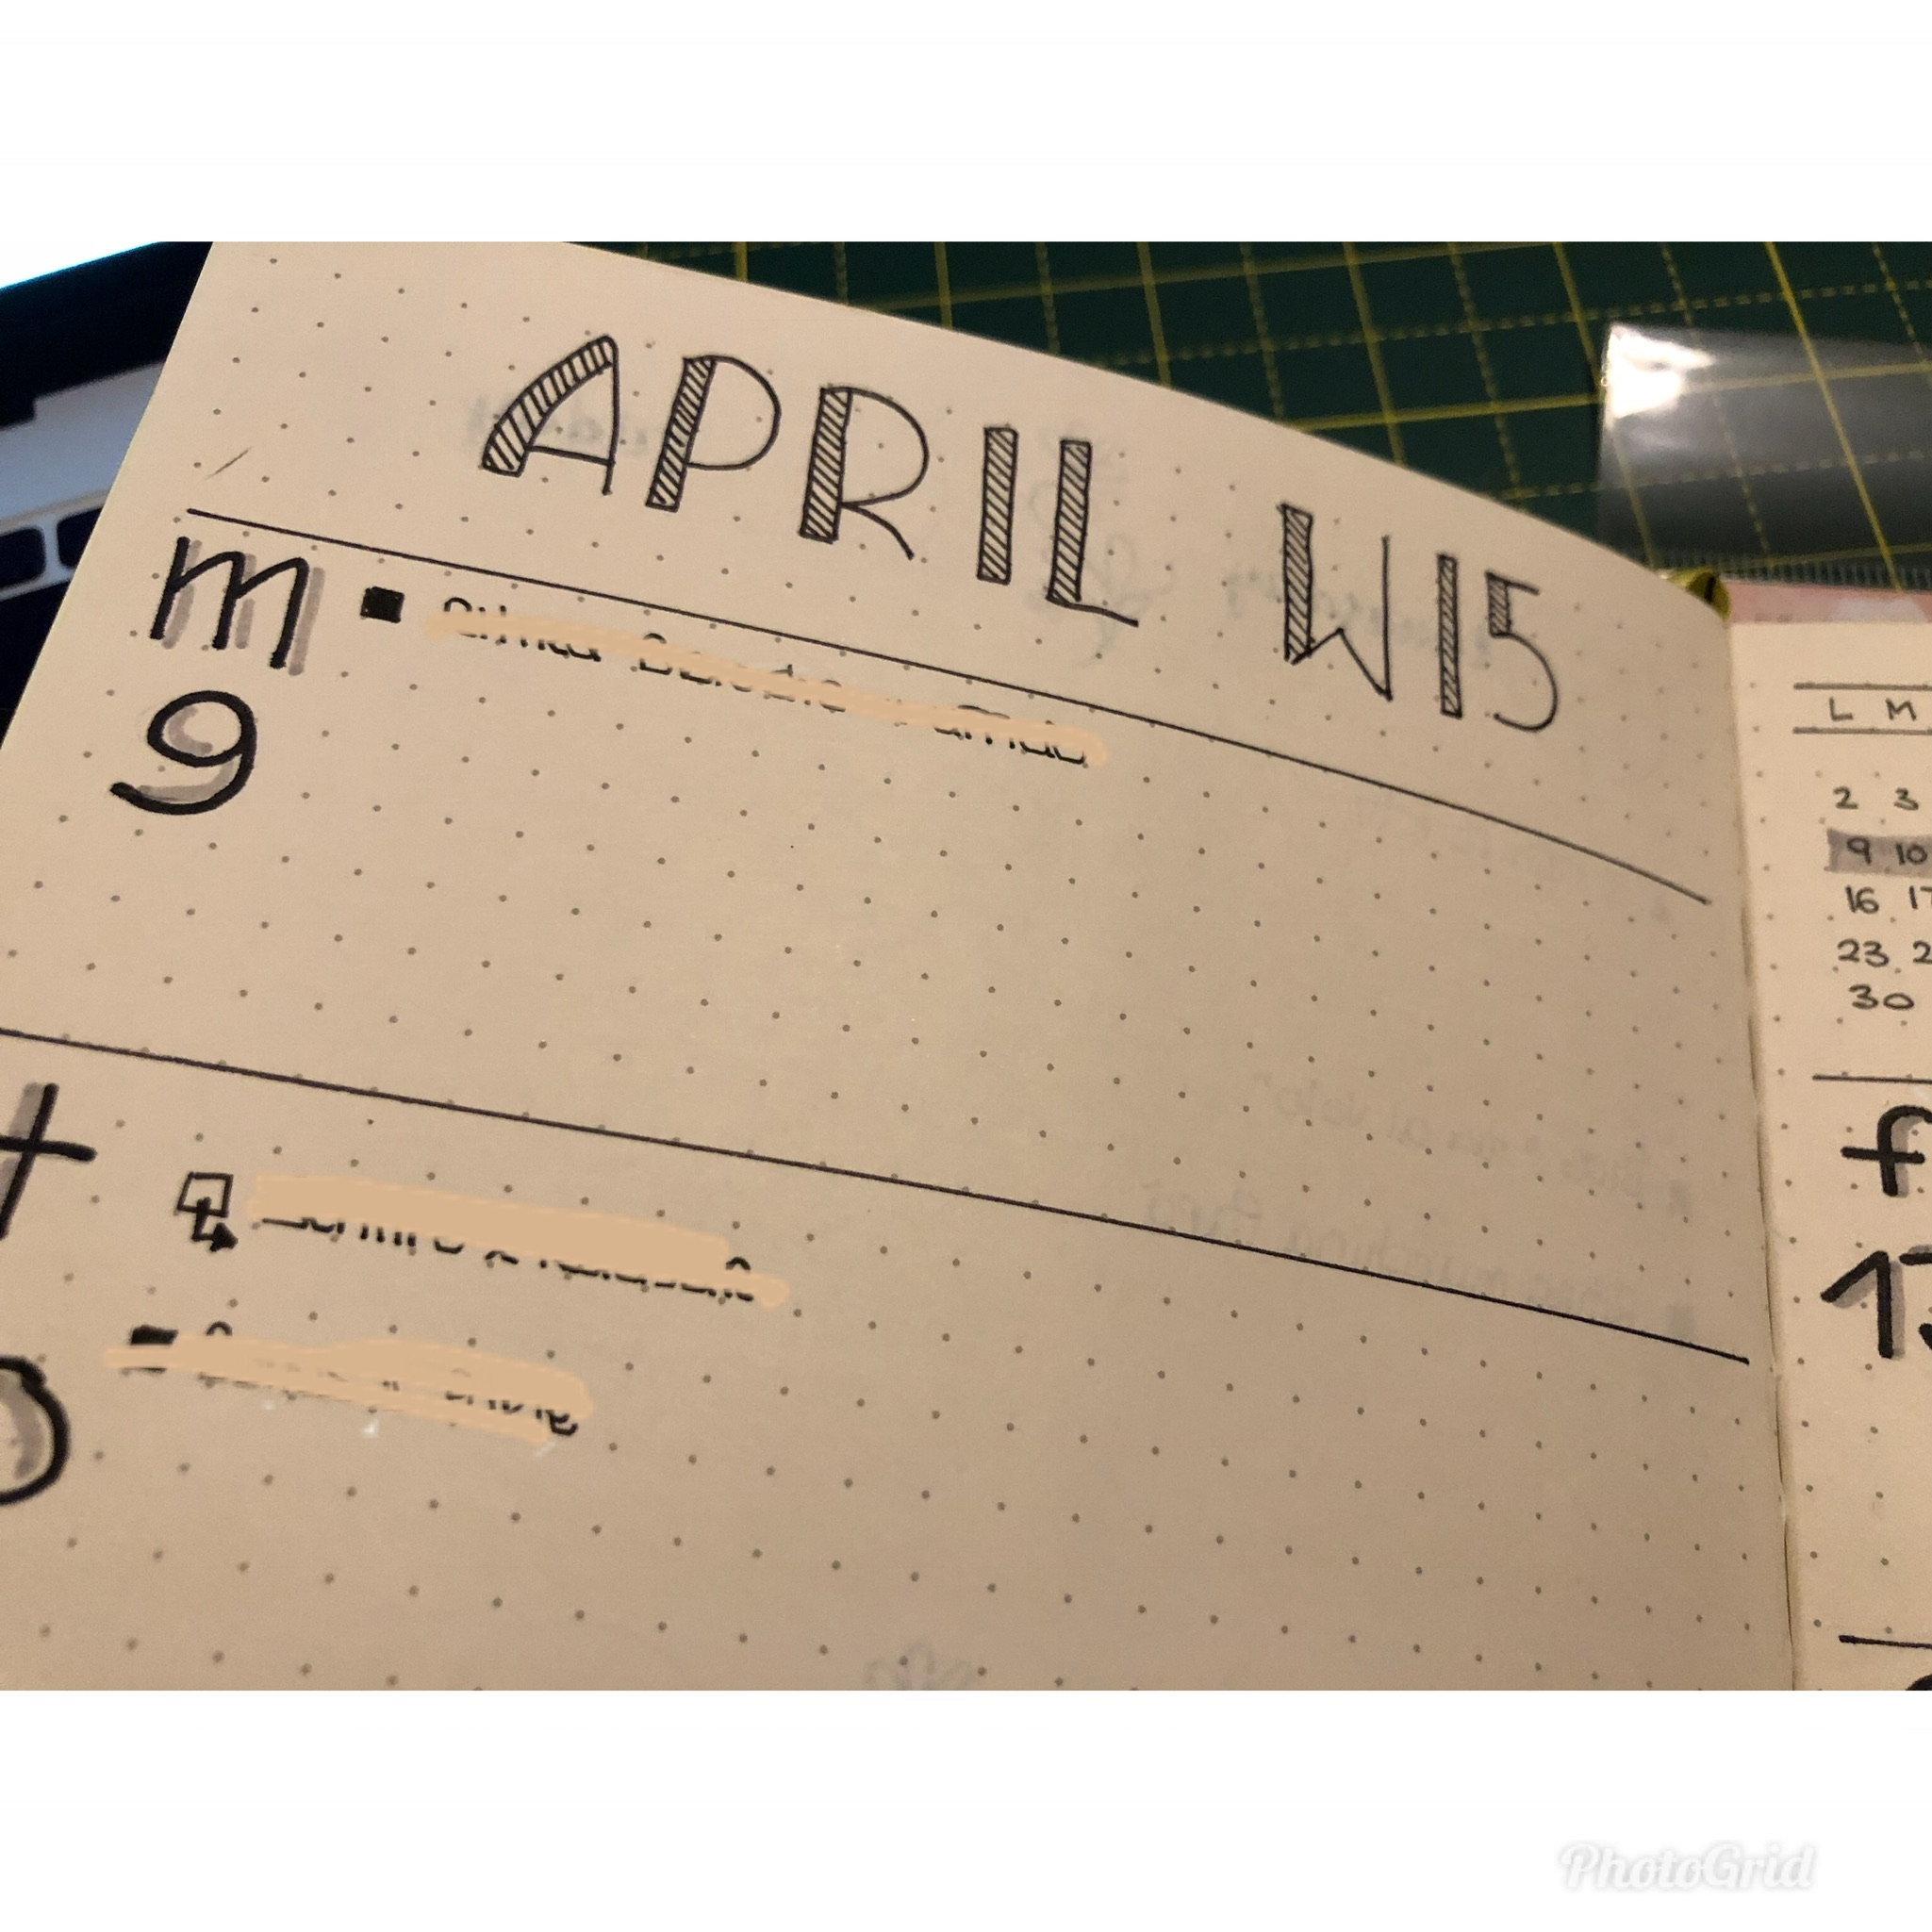 Bullet Journal: week #15 April